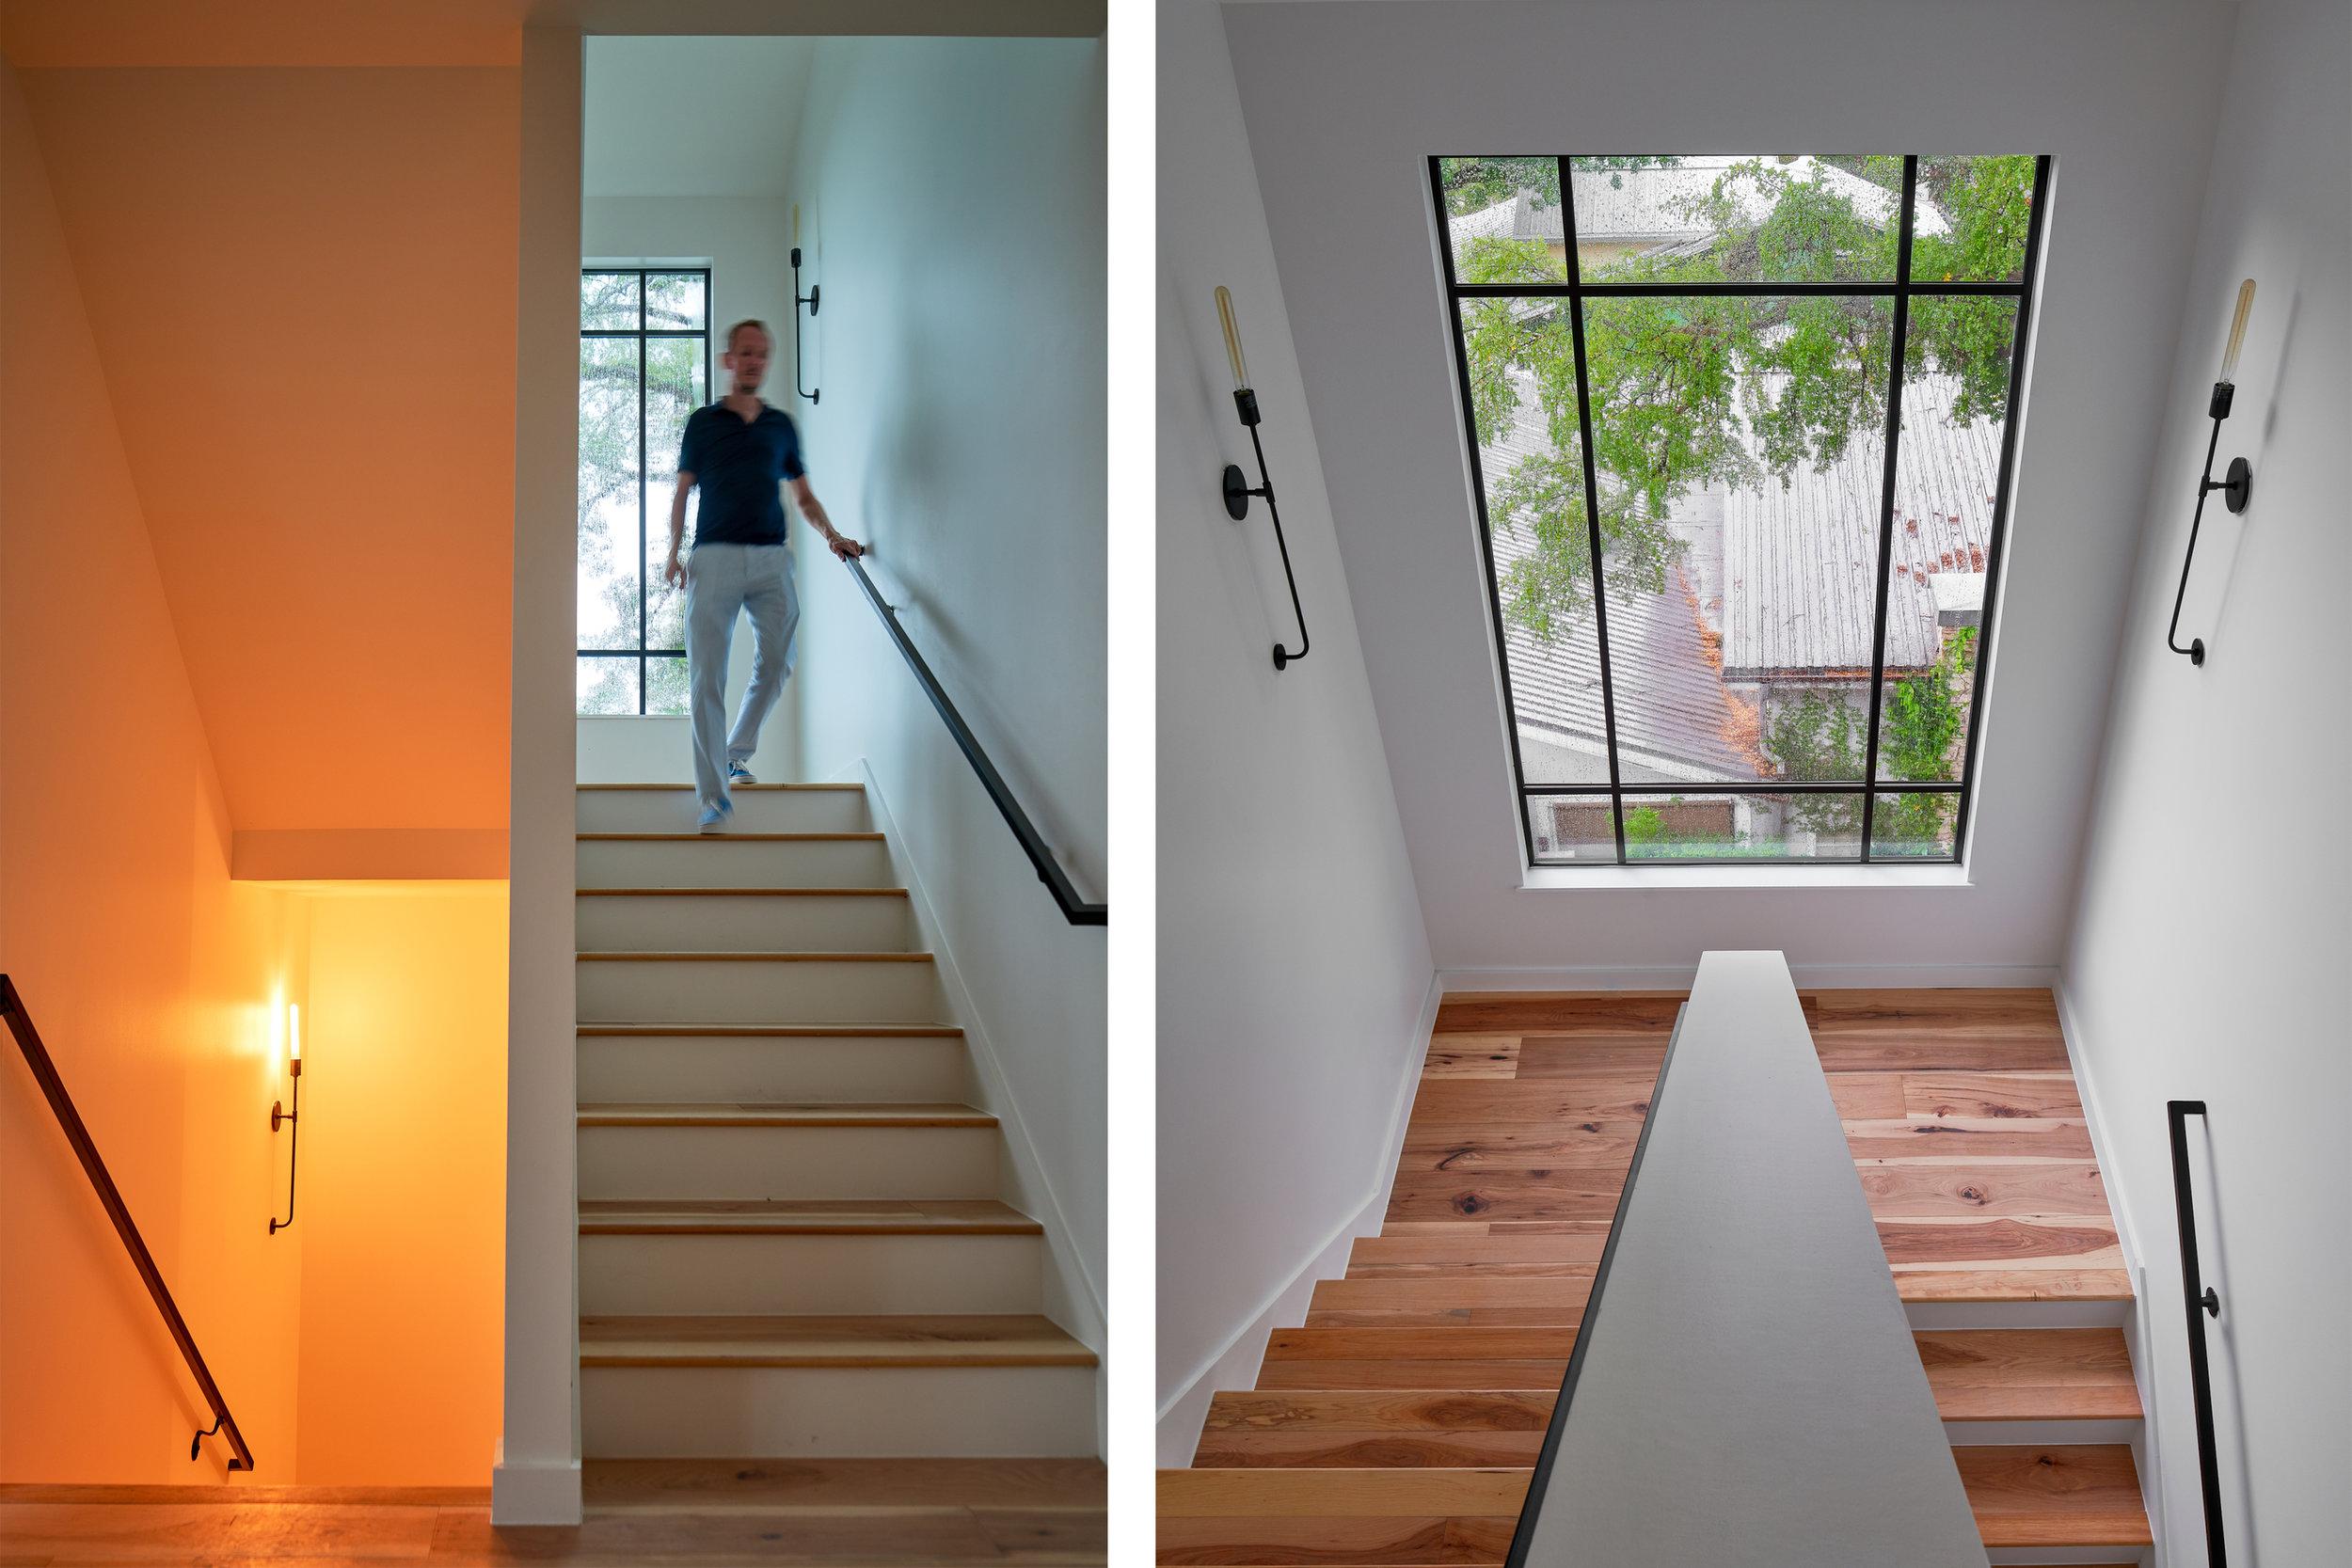 RabbGlen_Stairs.jpg